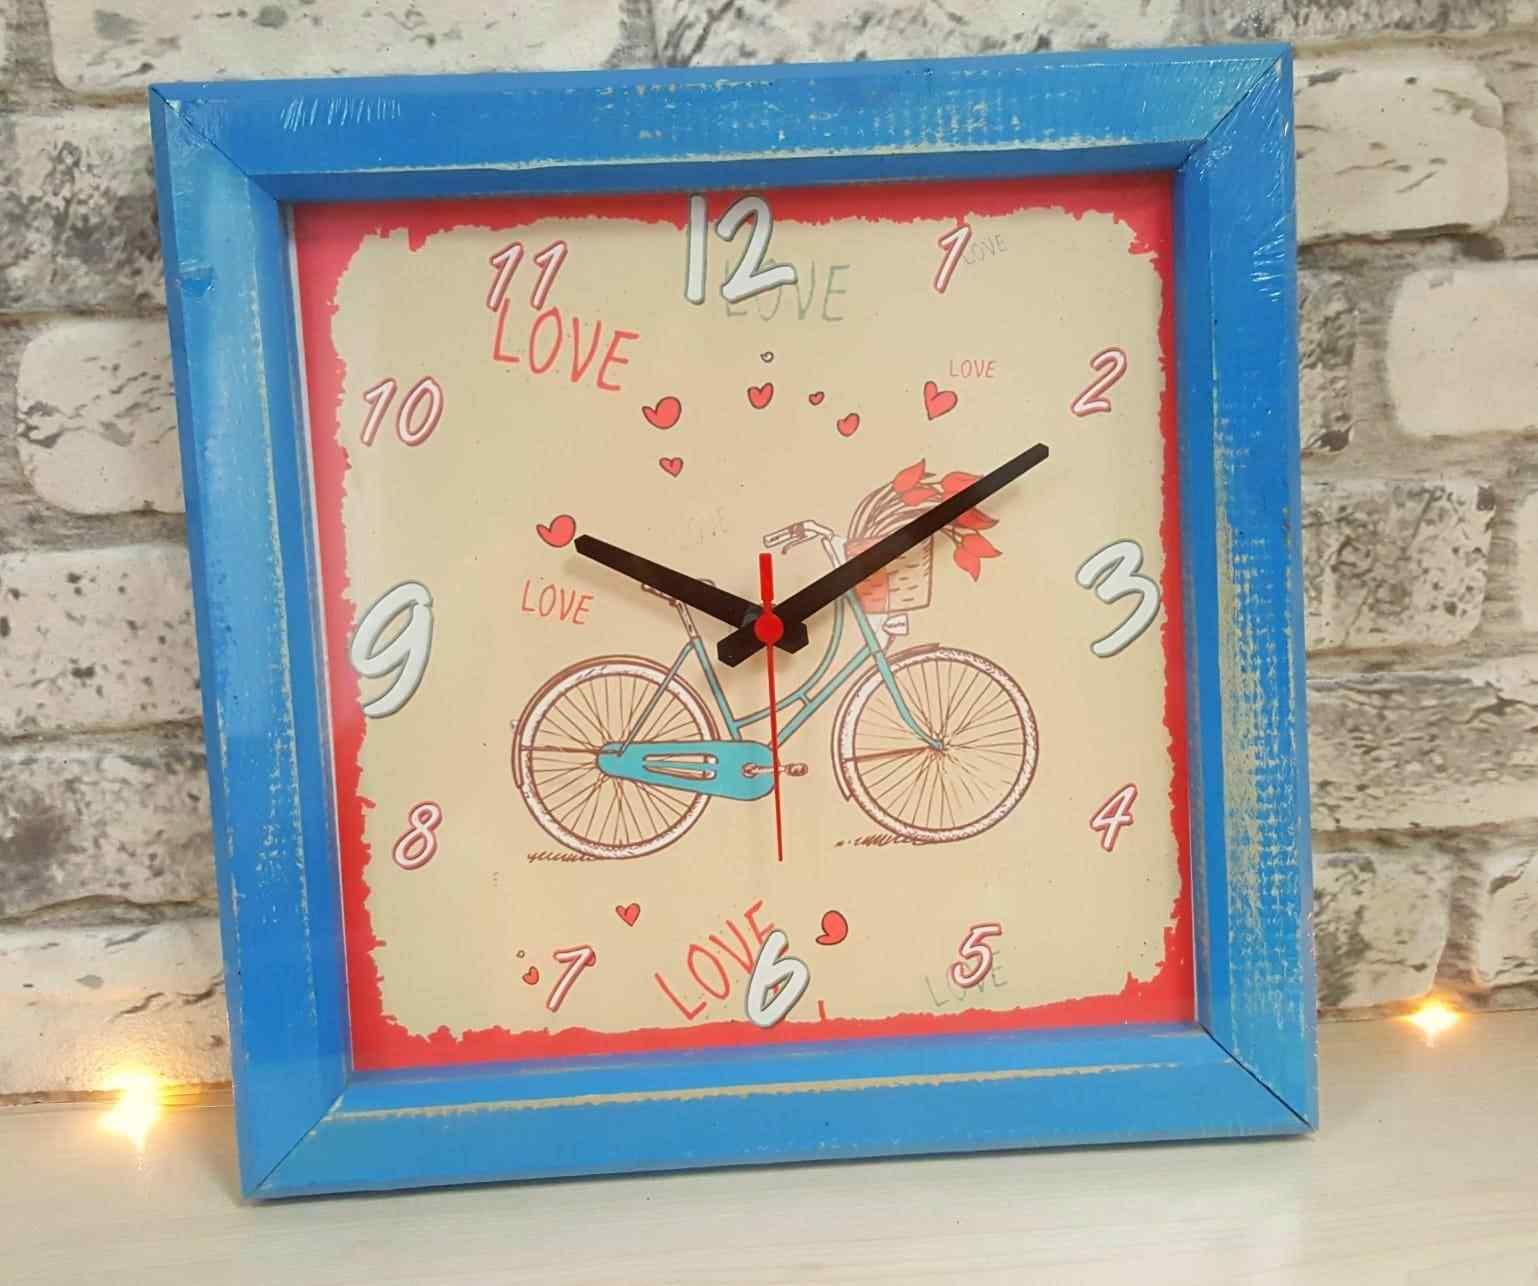 Sepetli Bisiklet Love Ahşap Kare Duvar Saati